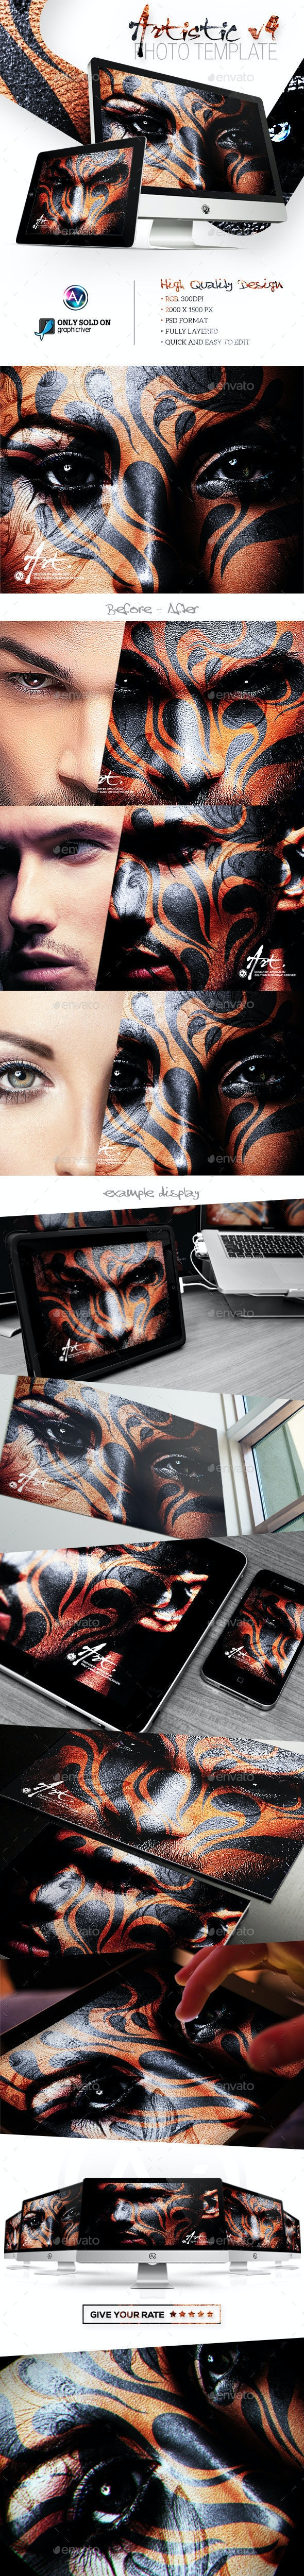 Artistic Photo Template V5 - Artistic Photo Templates